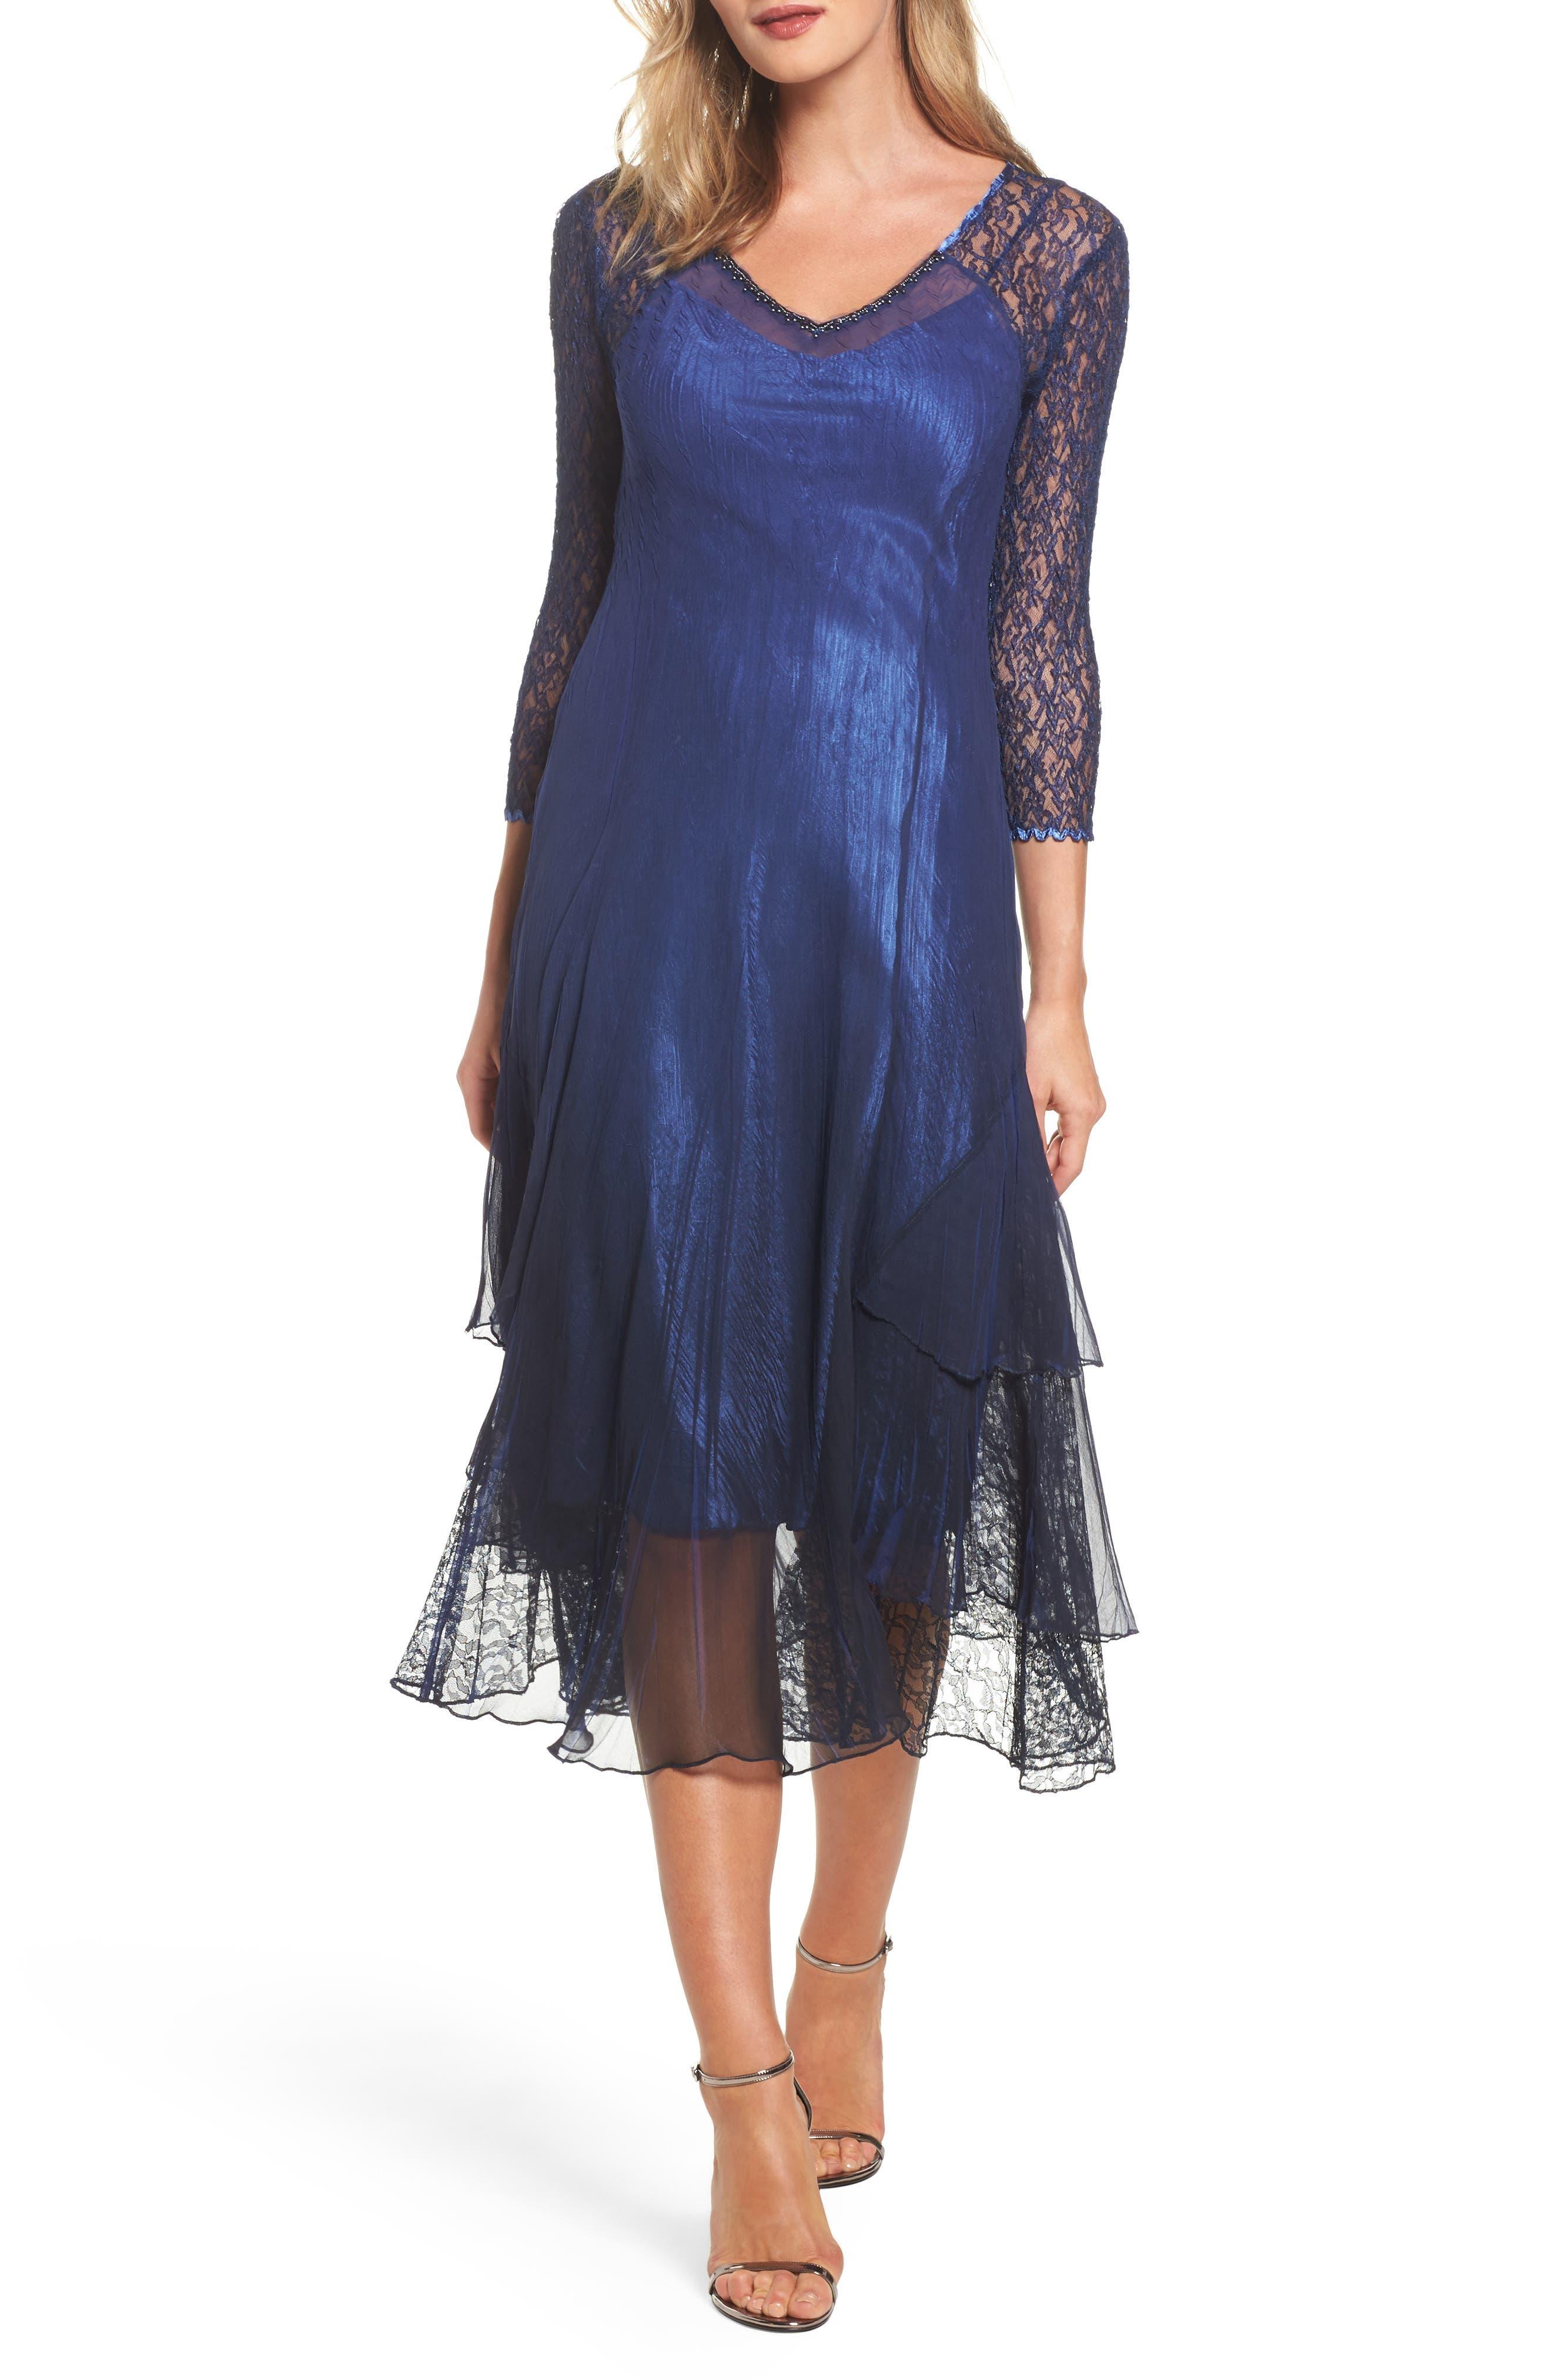 Alternate Image 1 Selected - Komarov Ombré Lace & Chiffon Midi Dress (Regular & Petite)